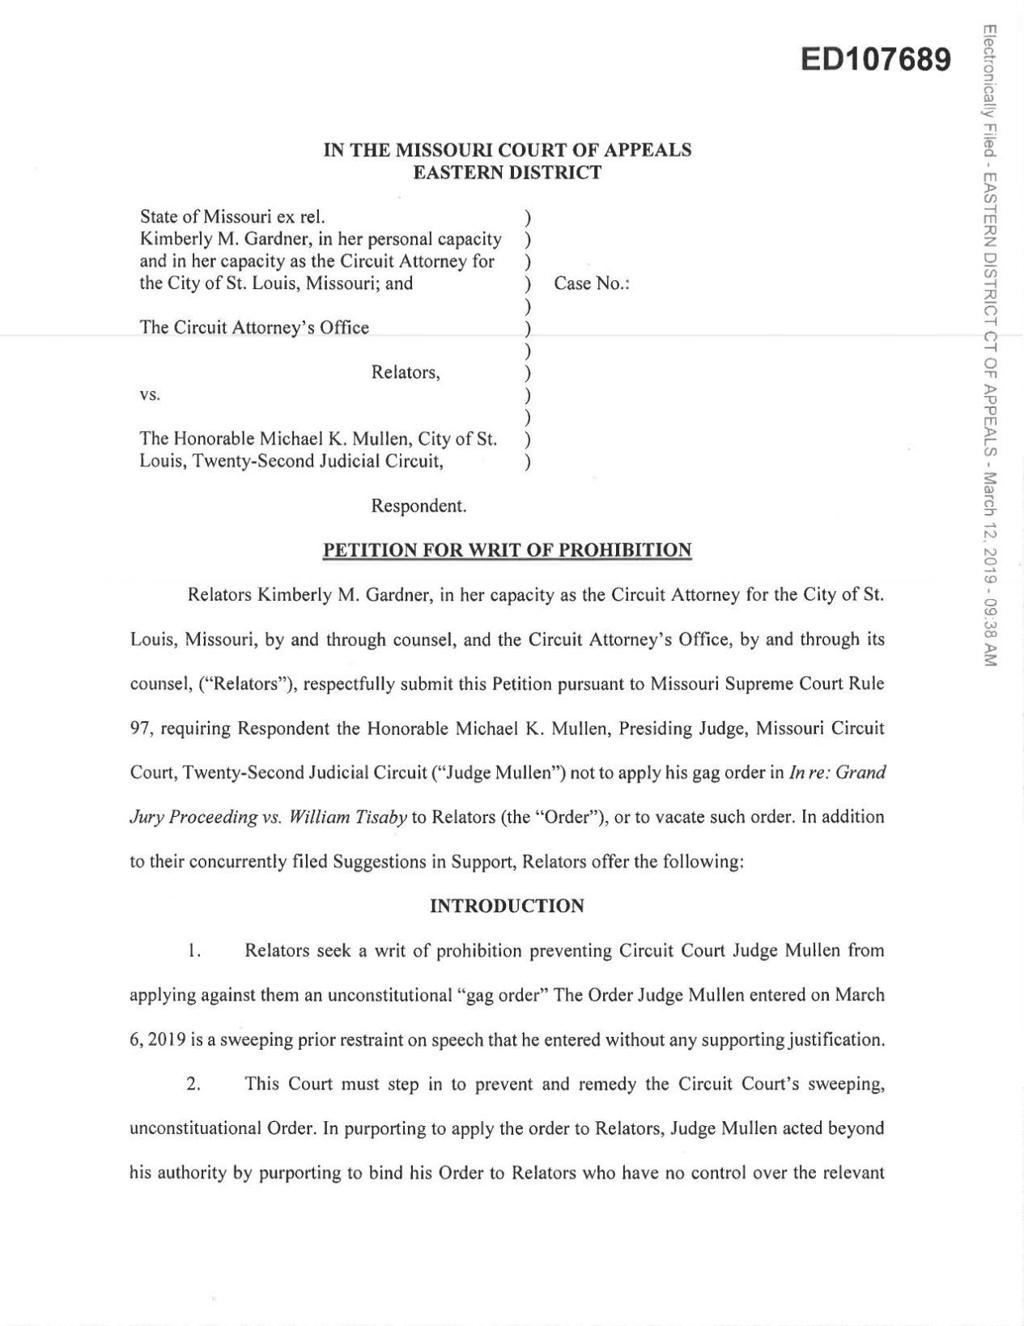 Appeals court delays order requiring Circuit Attorney's